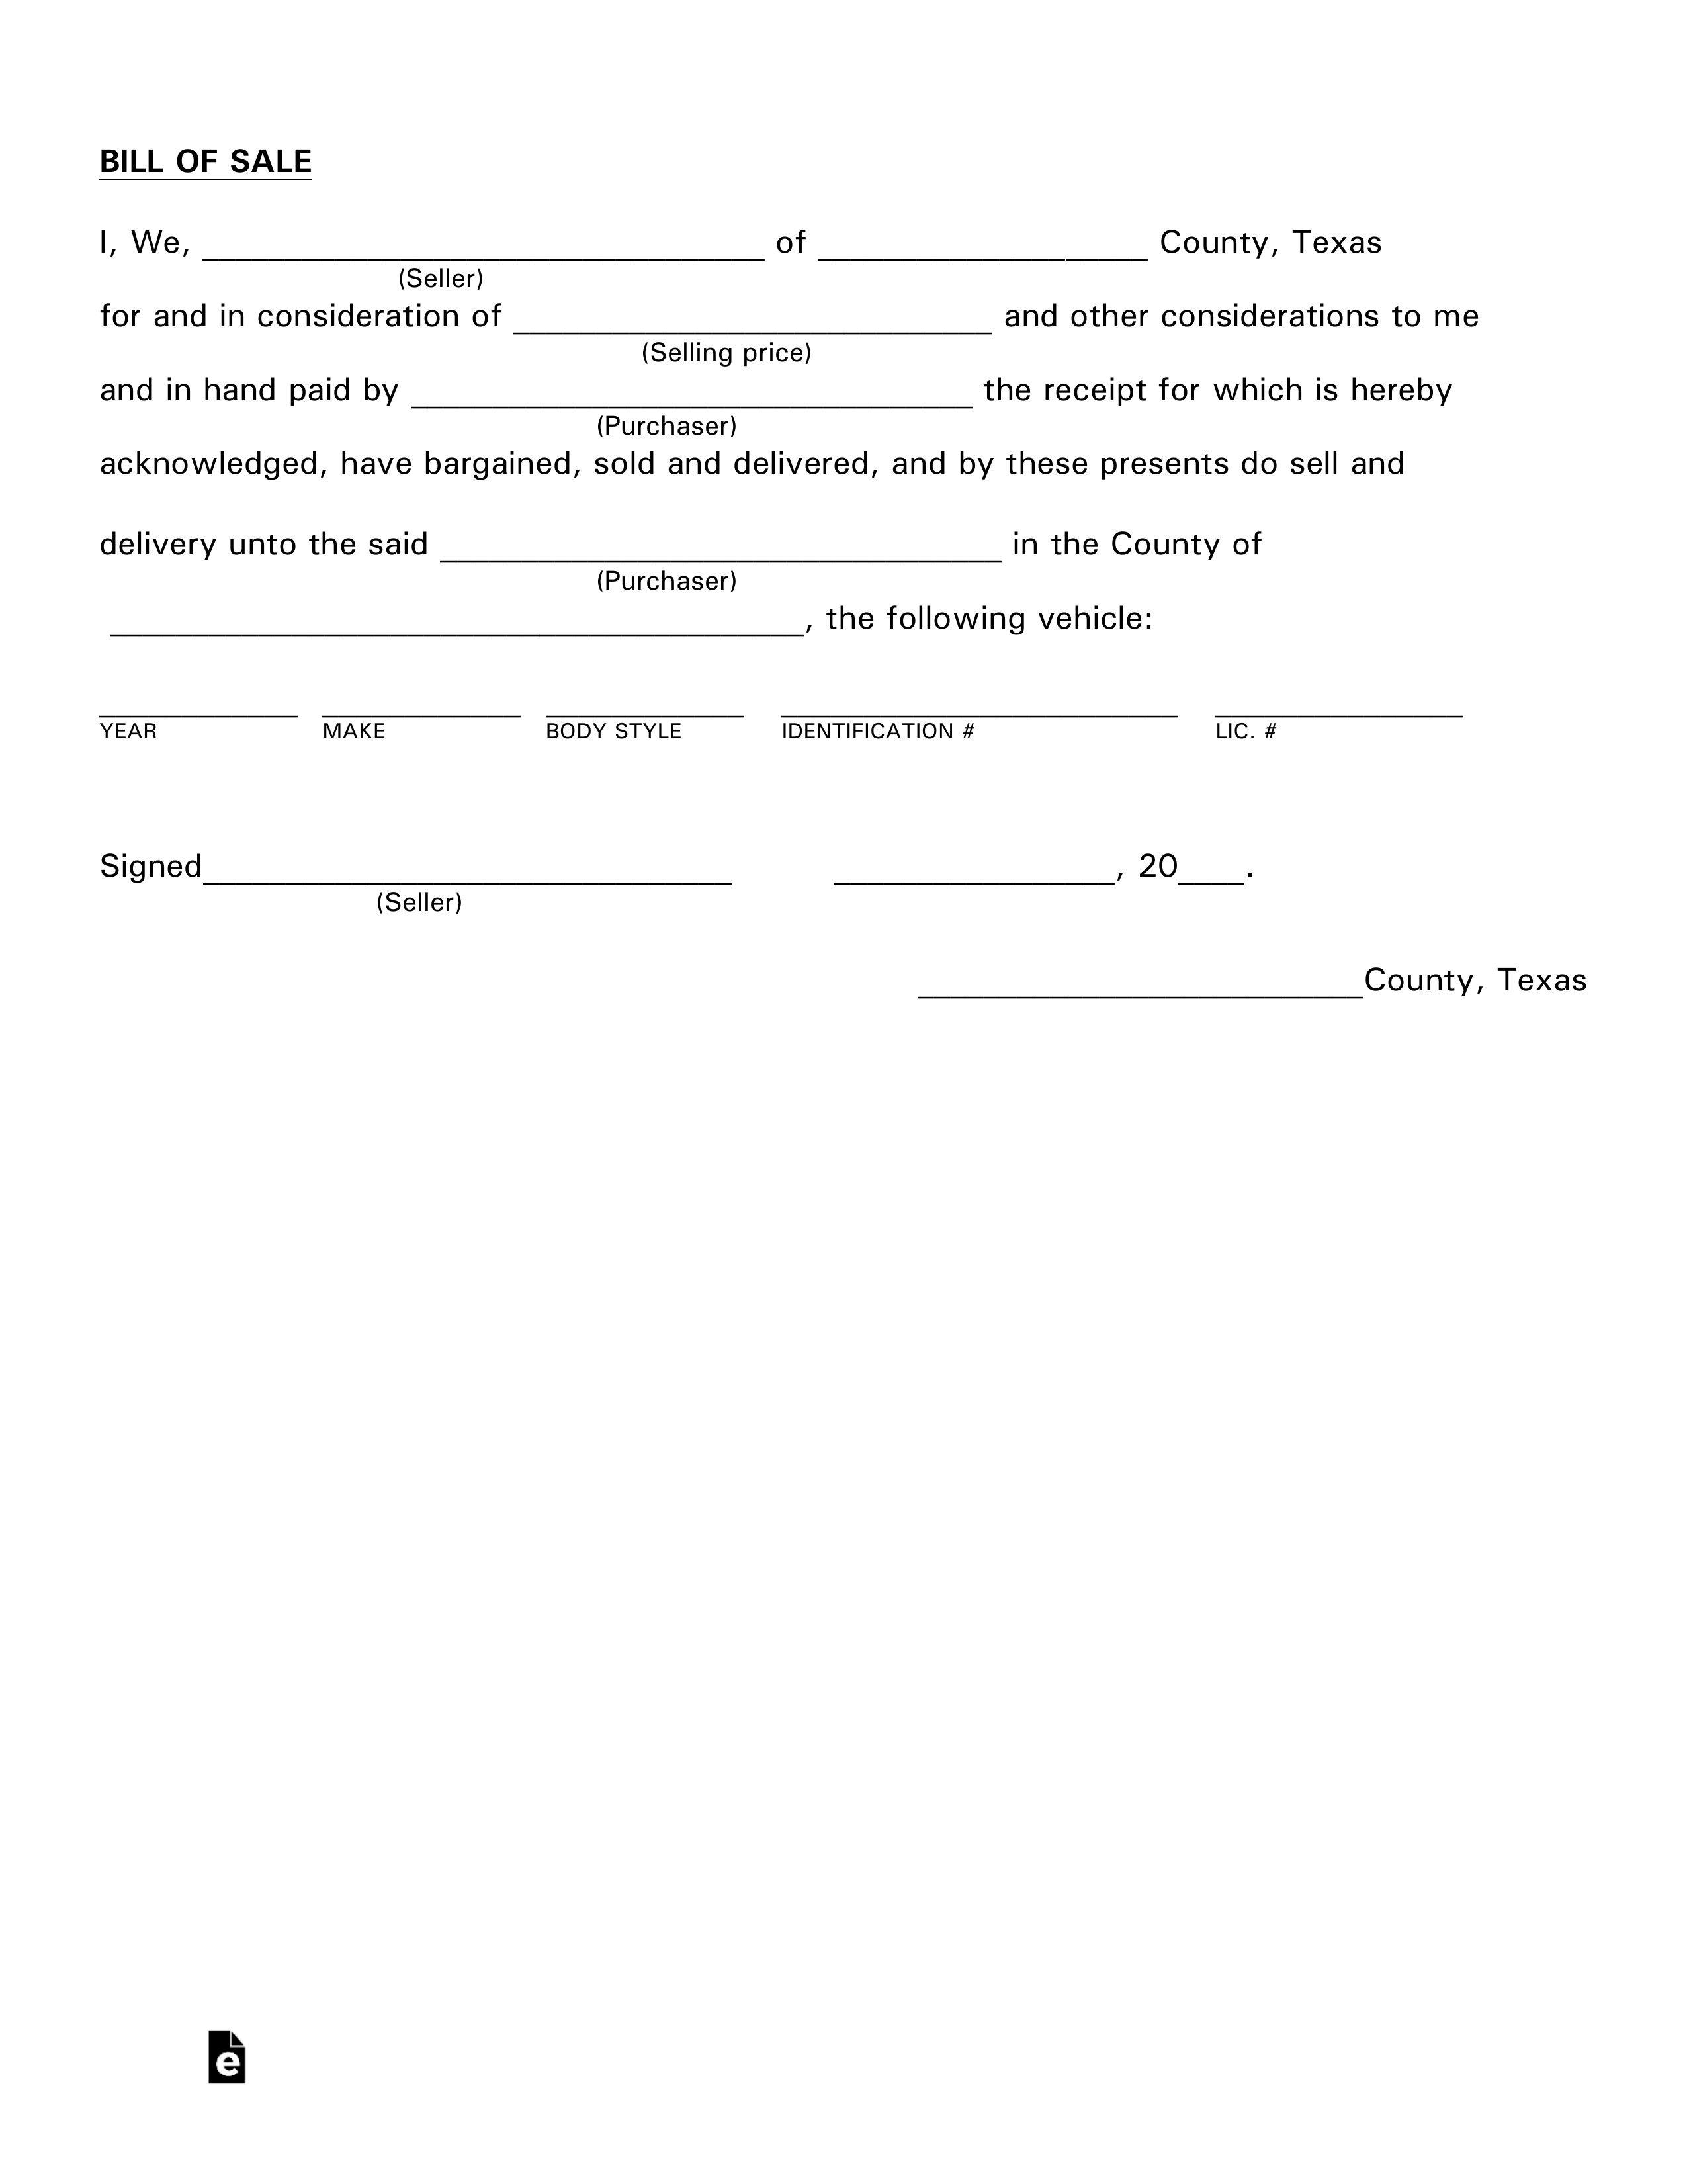 007 Imposing Bill Of Sale Template Texa Concept  Texas Free Car Form Dmv DocumentFull